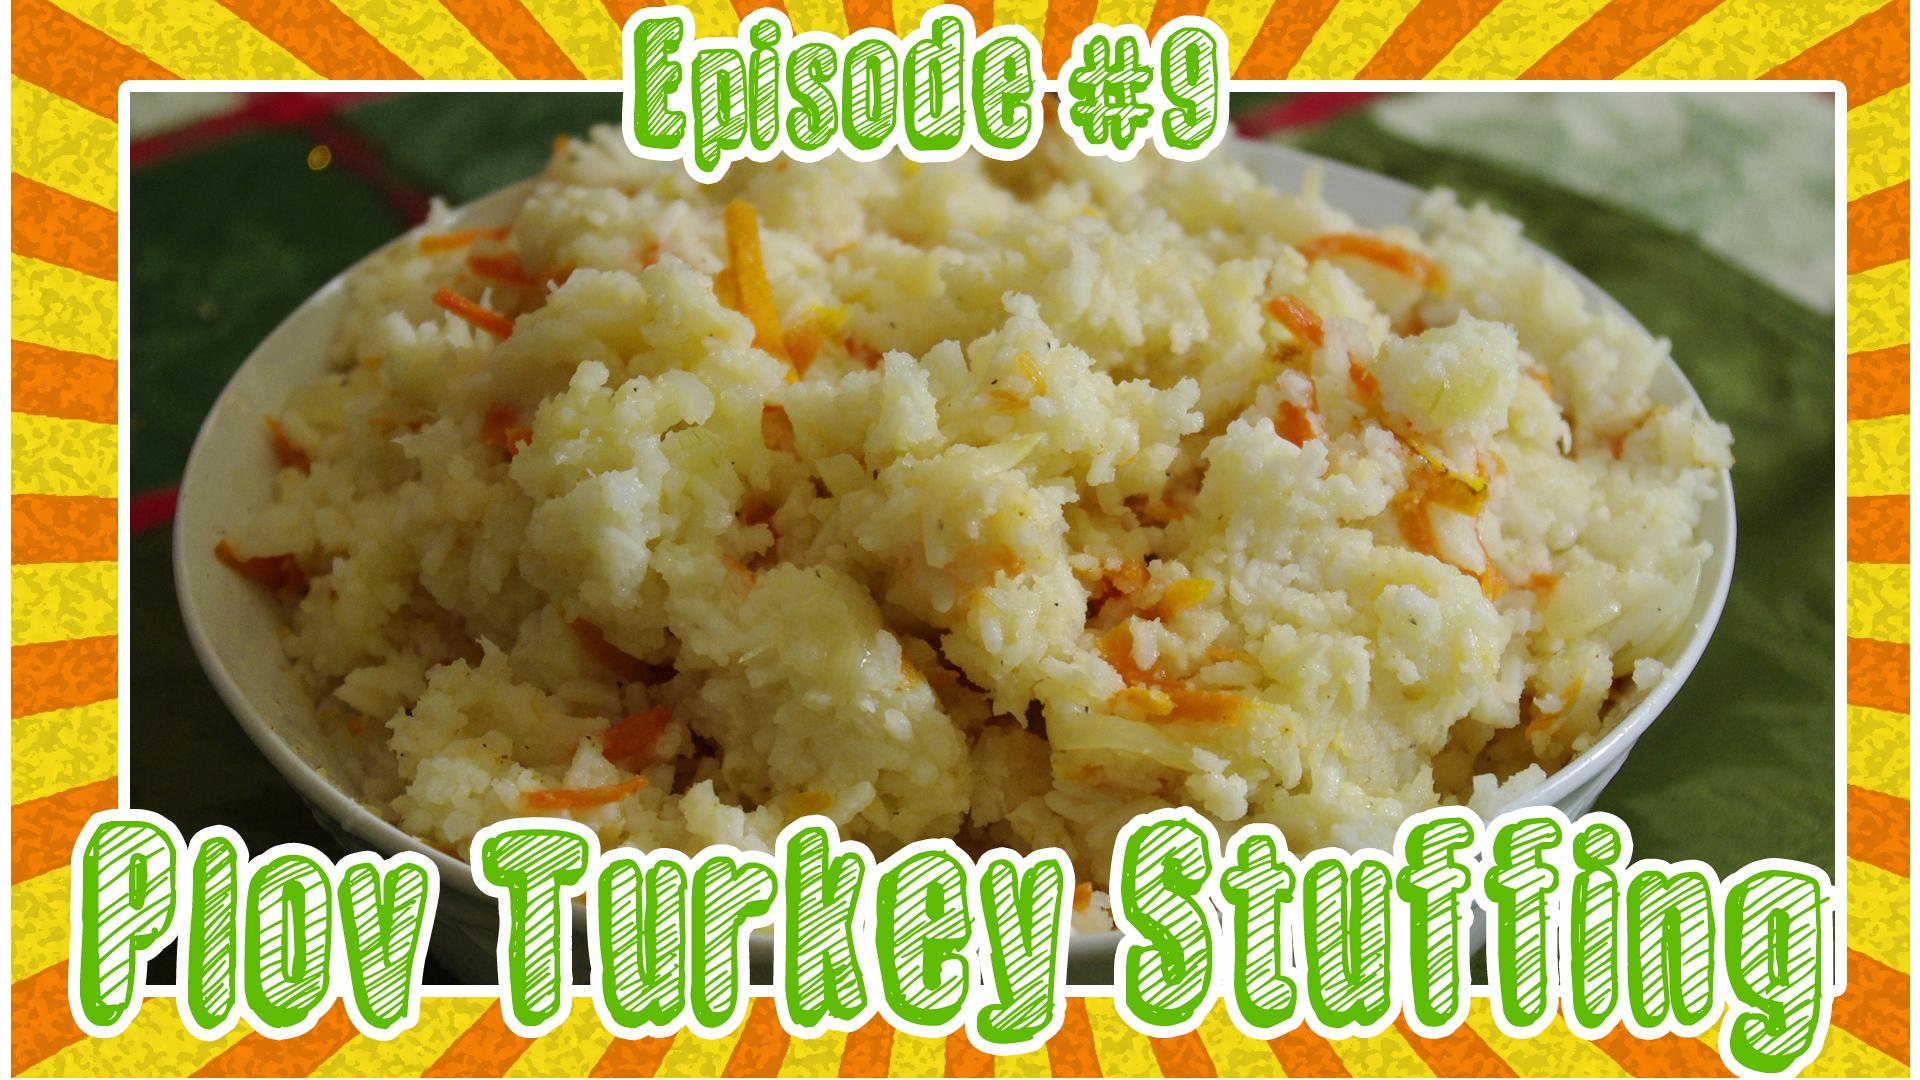 Thanksgiving Special Plov Turkey Stuffing